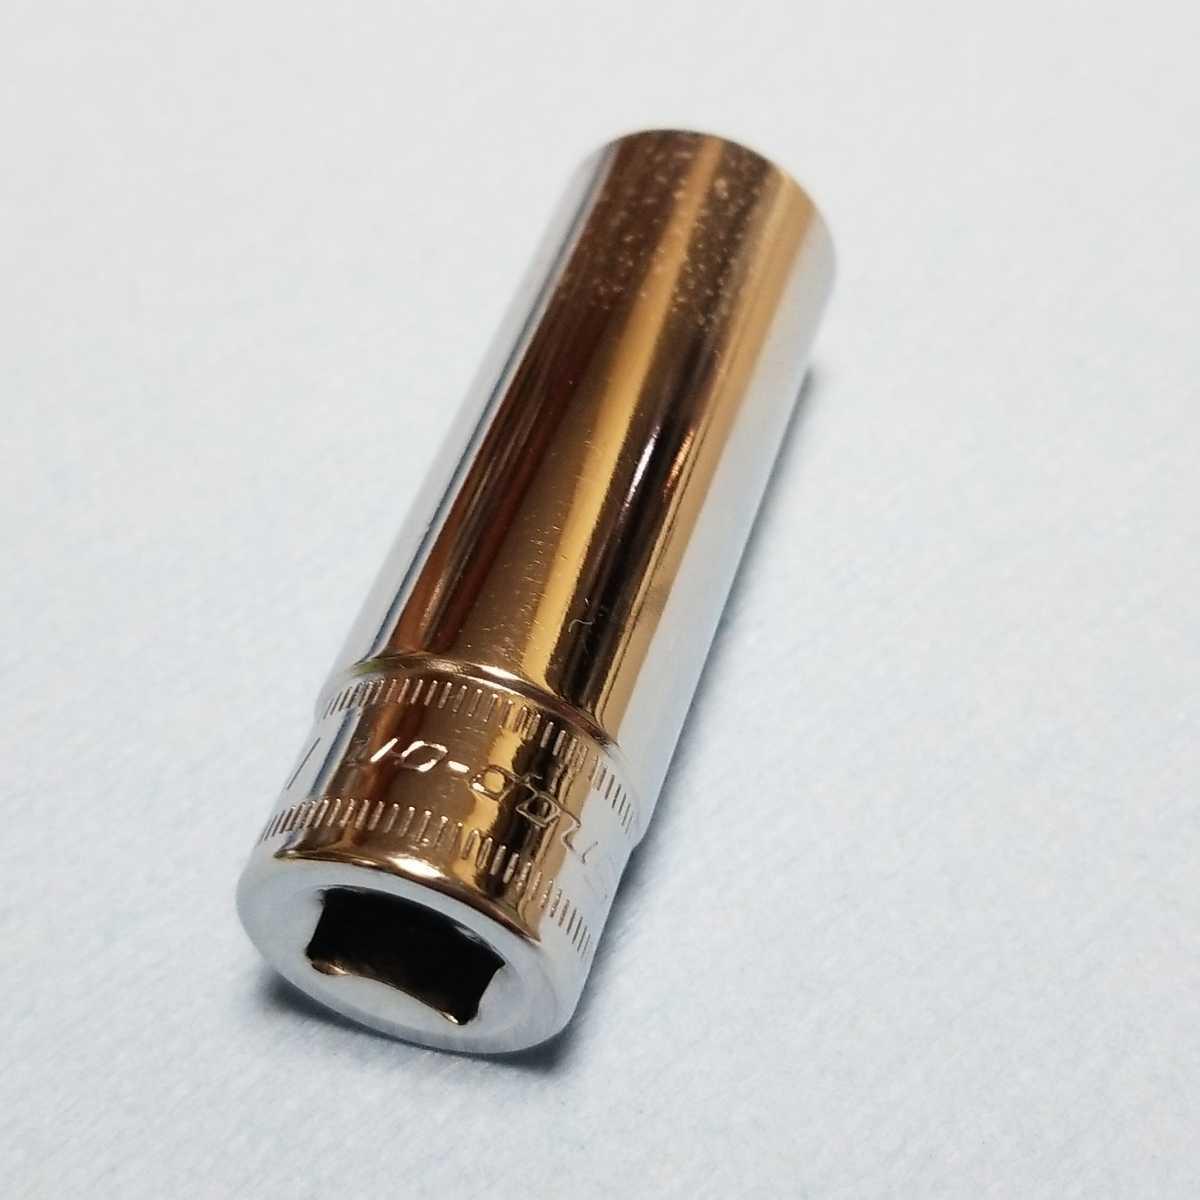 15mm 3/8 ディープ スナップオン SFSM15 (6角) 中古品 保管品 SNAPON SNAP-ON ディープソケット ソケット 送料無料 Snap-on _画像4